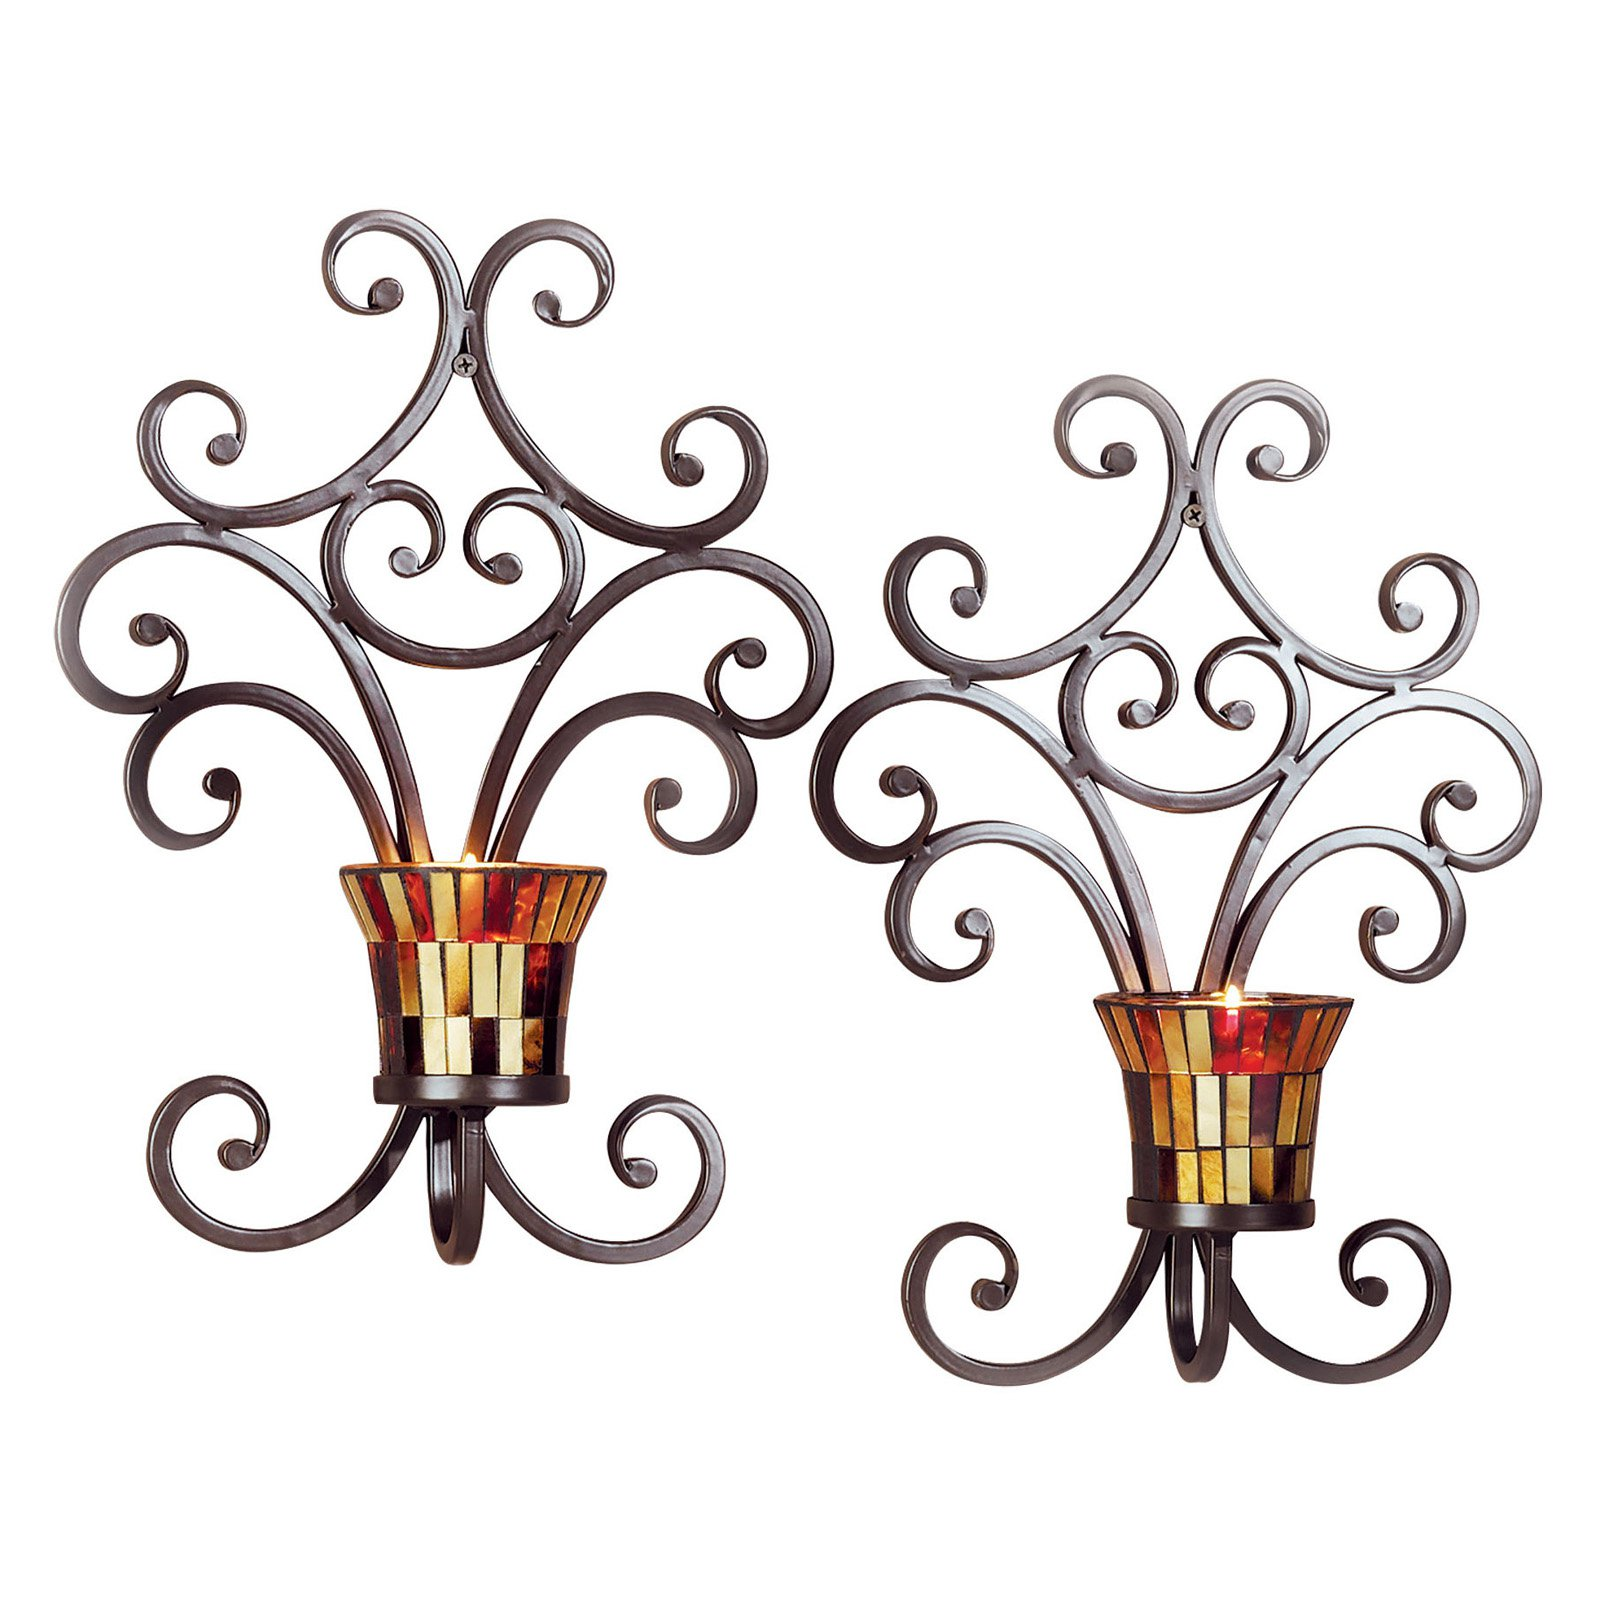 ELK Lighting Truffle Wall Sconce Candle Holder Set of 2 by ELK